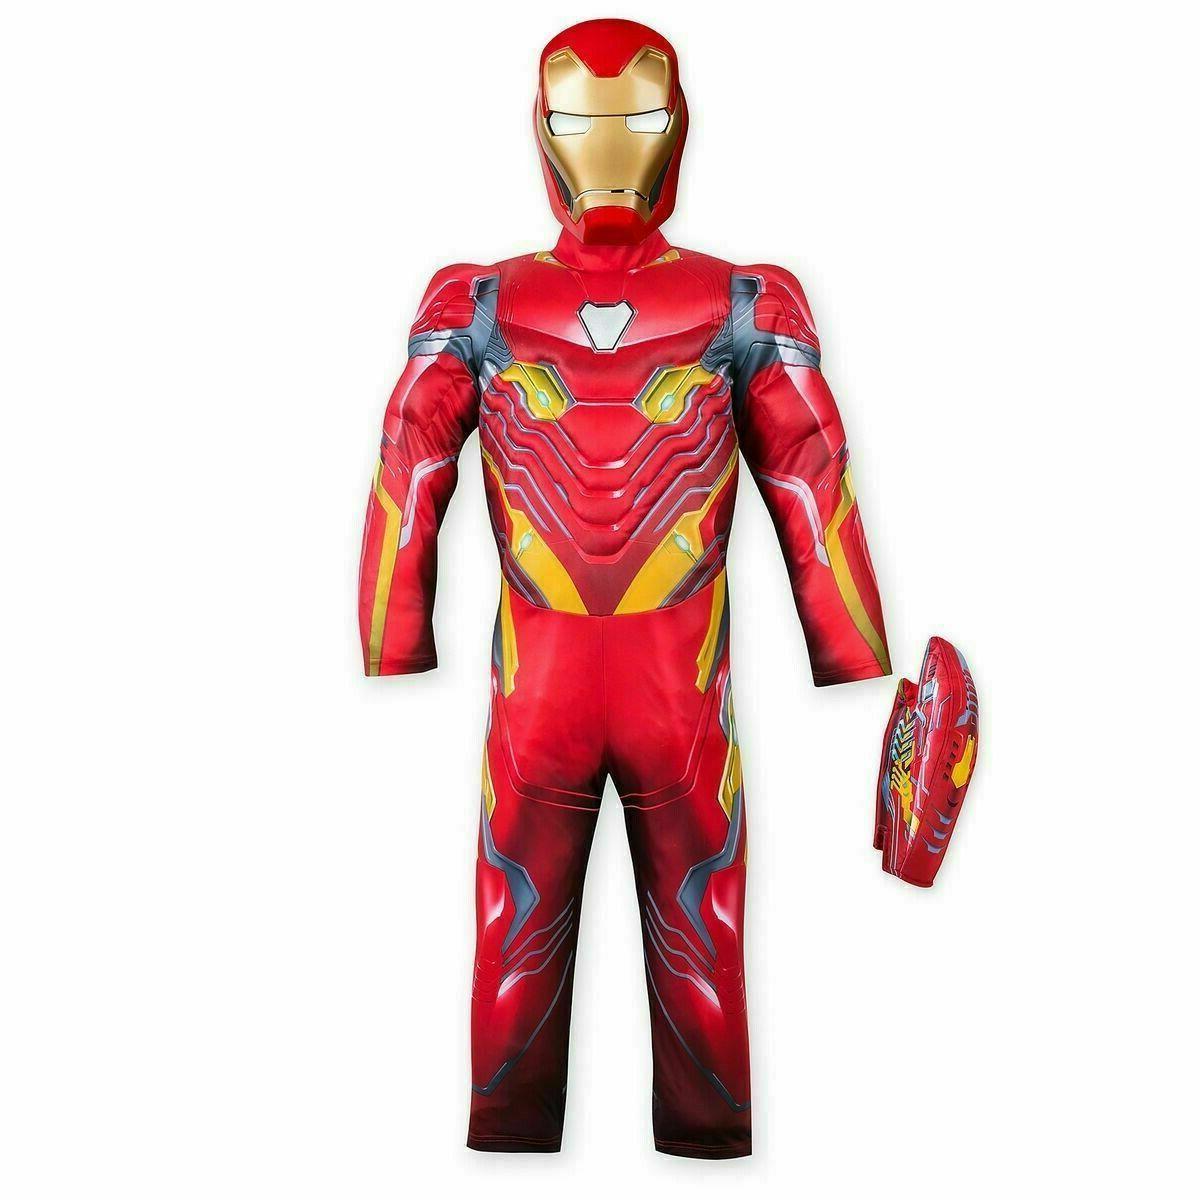 marvel avengers iron man costume 3pc set